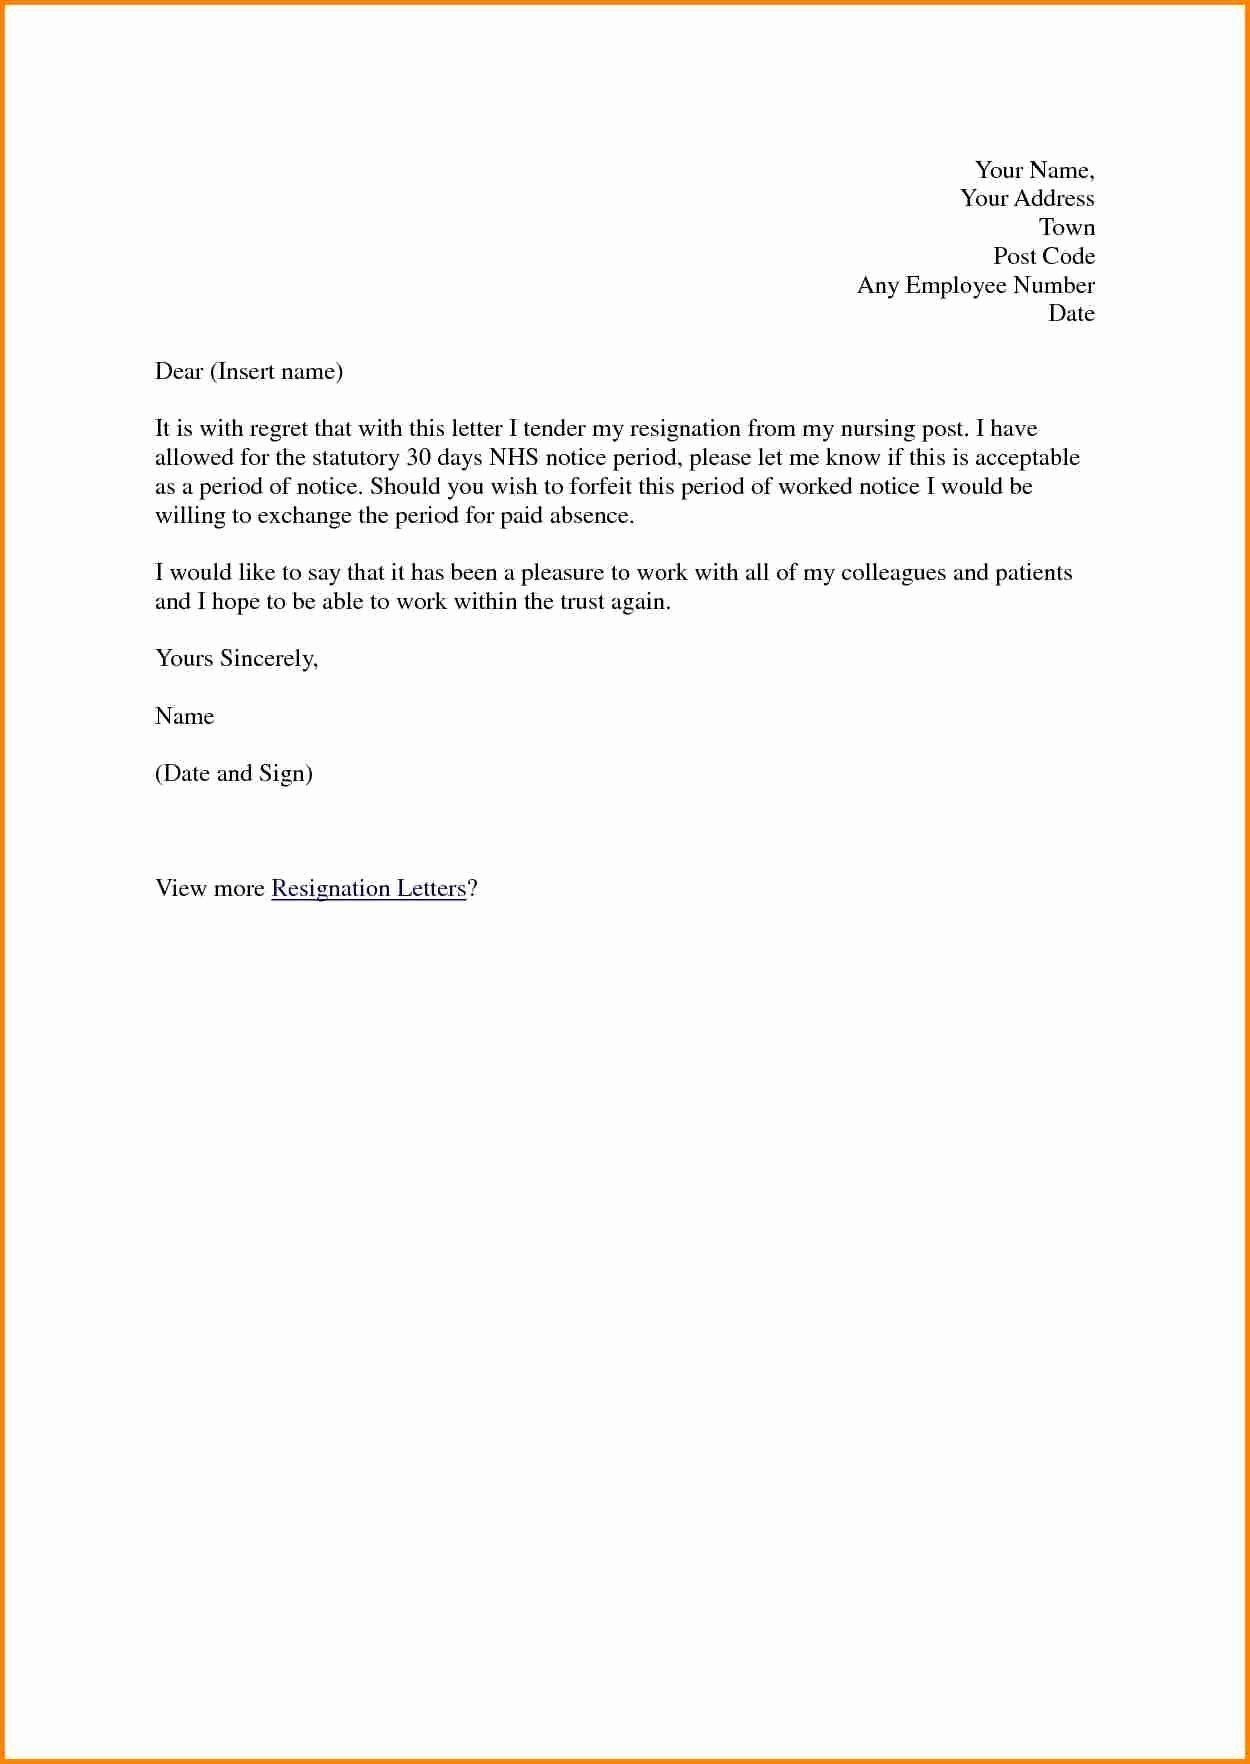 Sample Resignation Letter Nurses Unique 14 Resignation Letter for